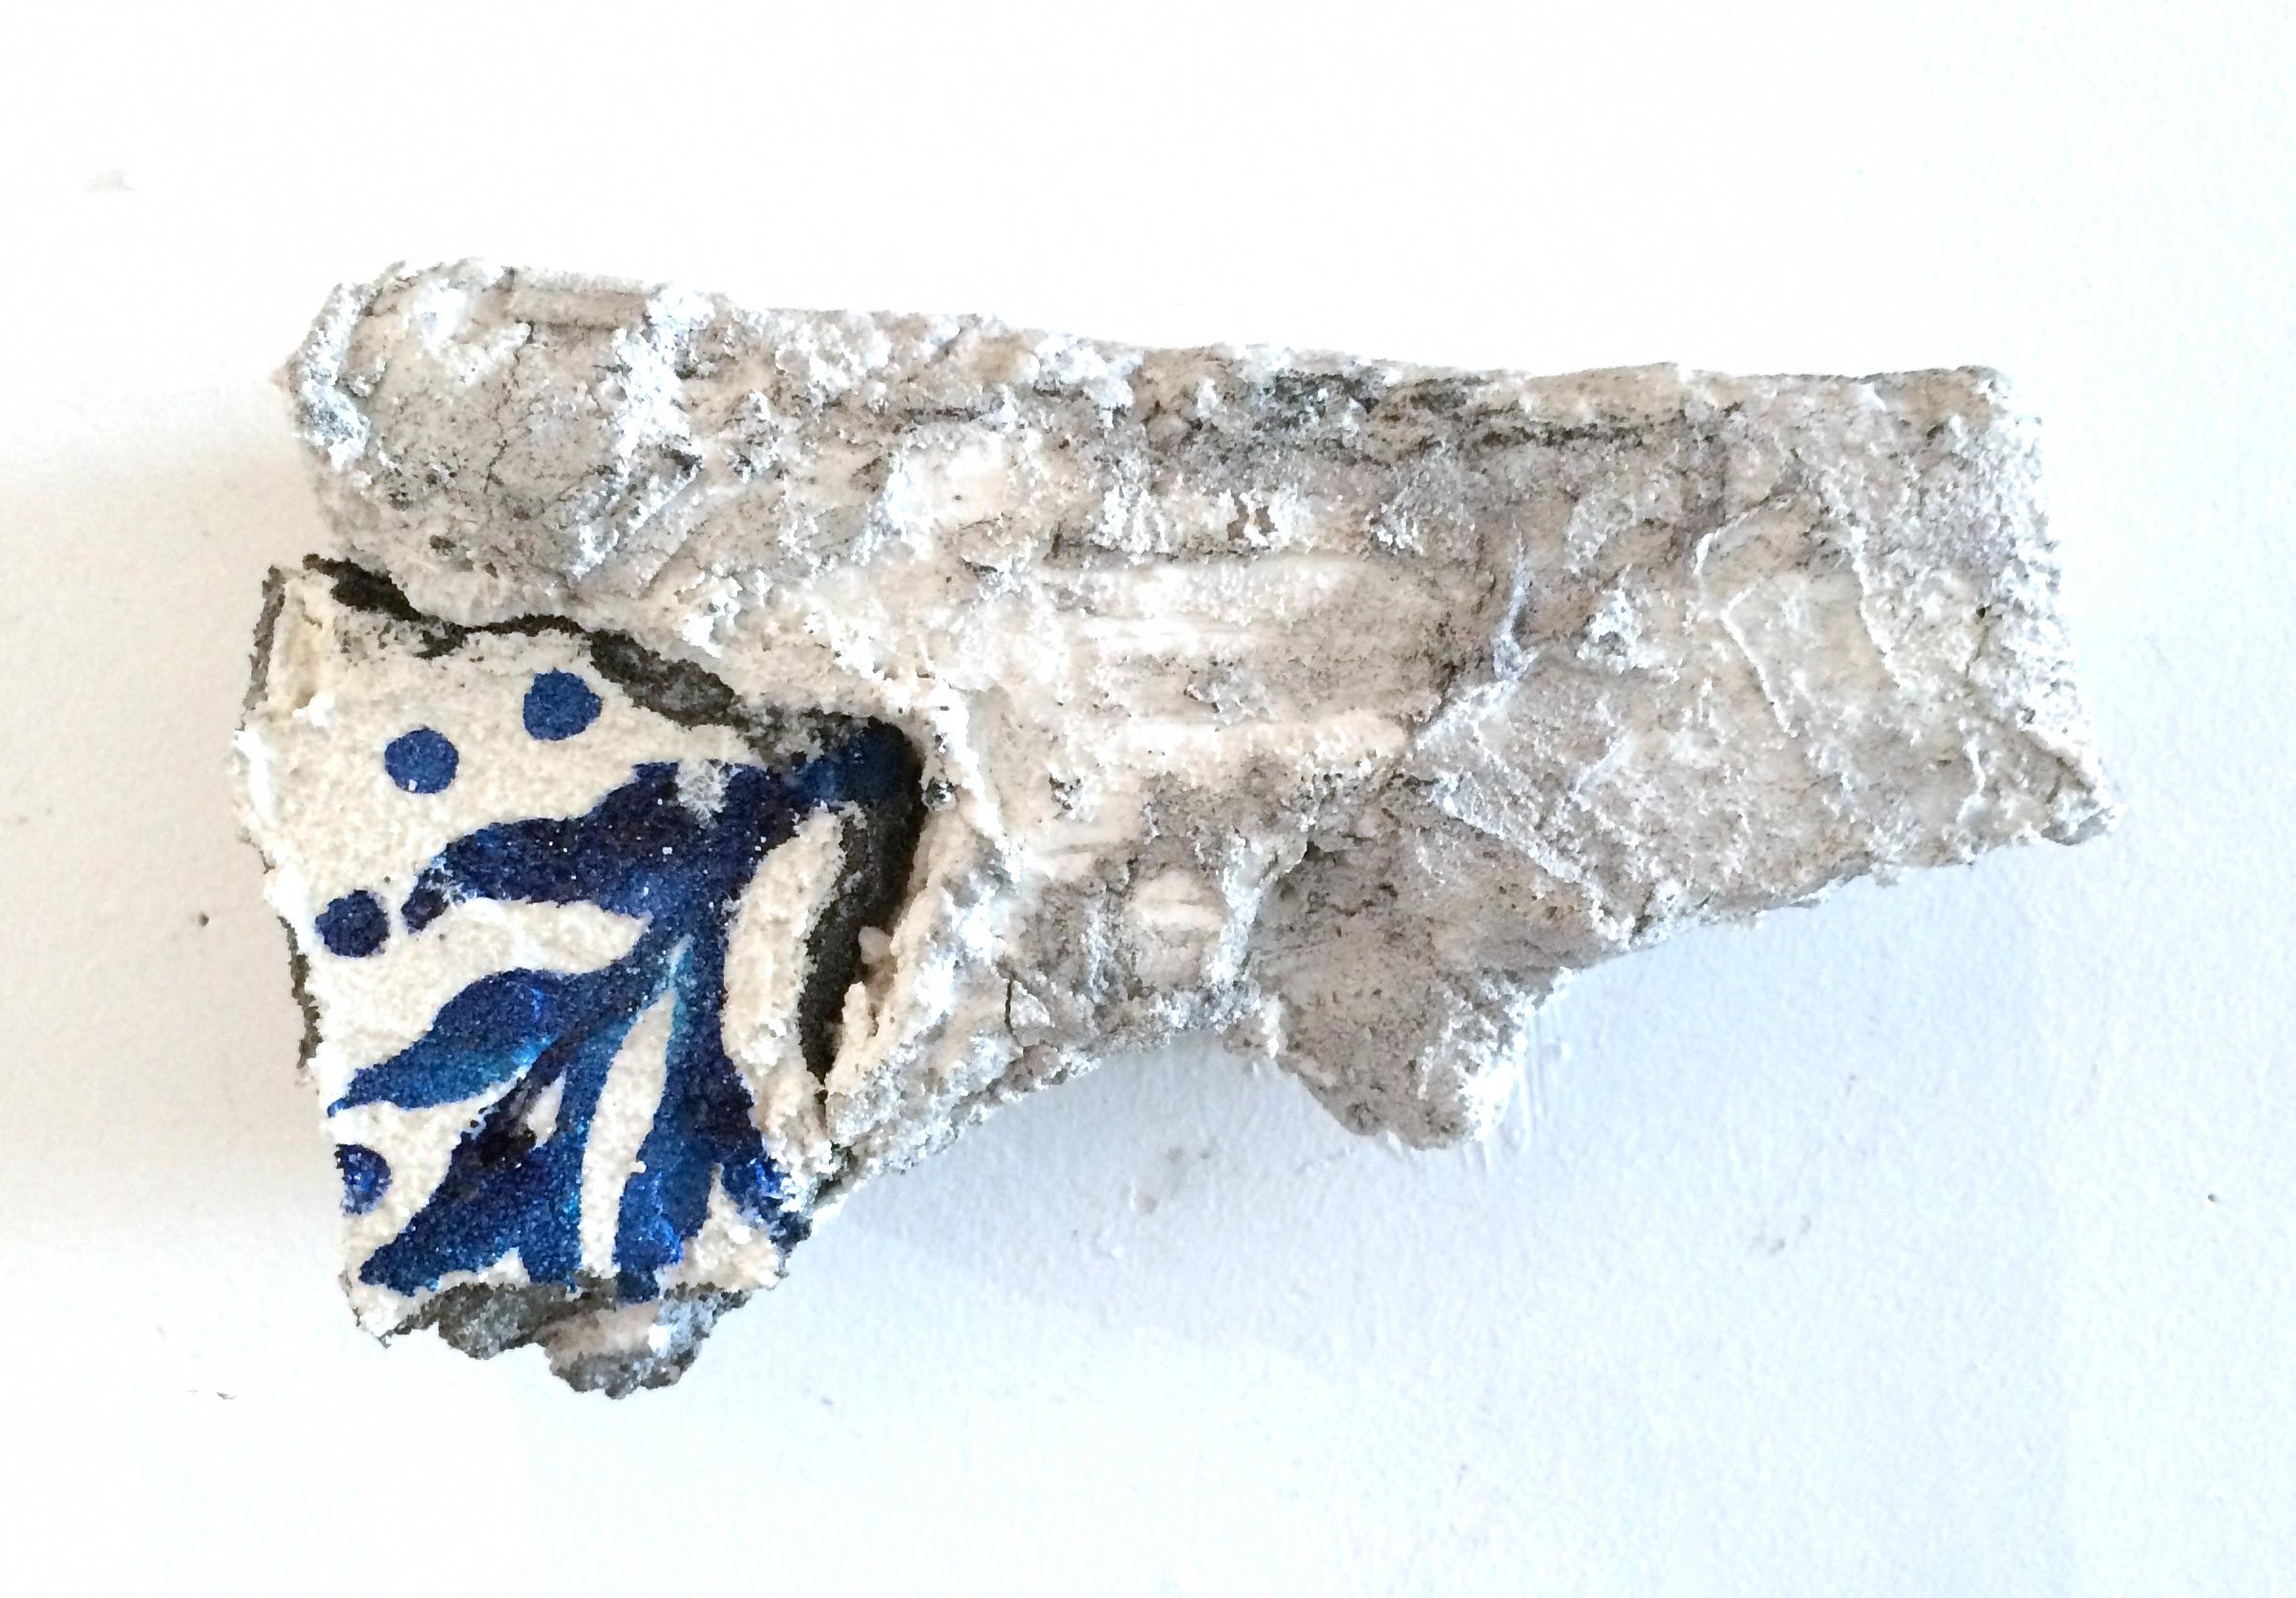 Nancy Wisti Grayson,  Embedded Fragment: Branch  (Mementos), Acrylic and grout on recycled styrofoam